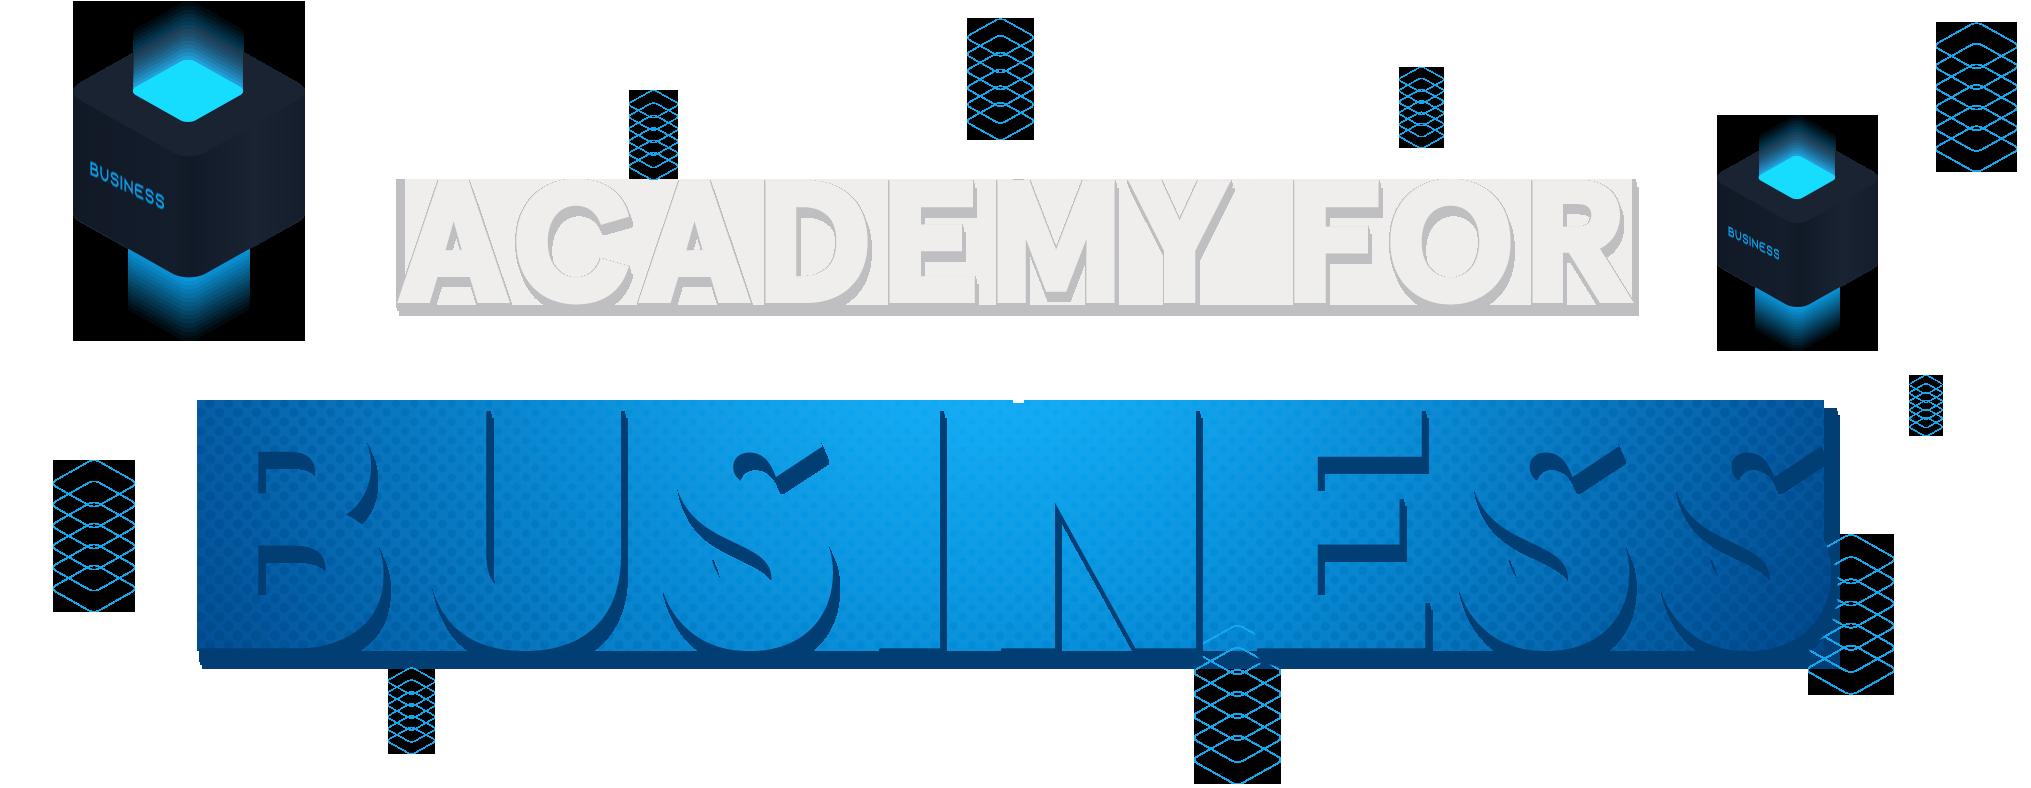 AcademyForBusiness